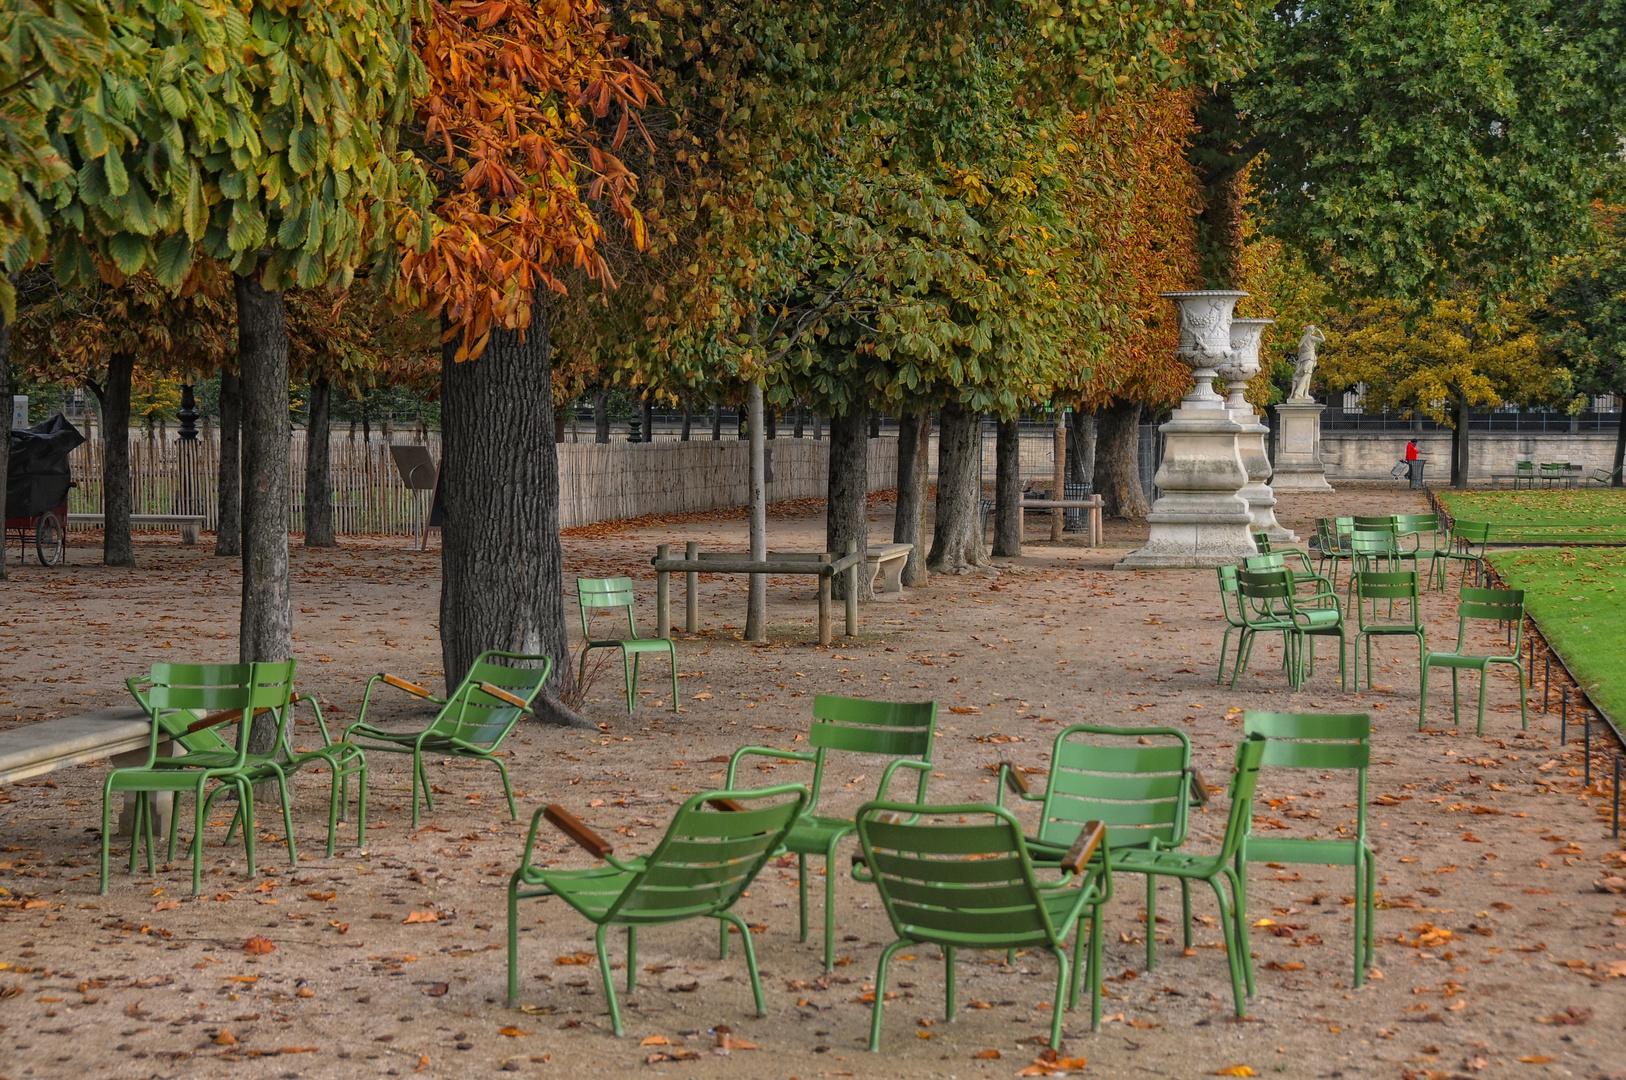 Paris - Herbst im Jardin des Tuileries